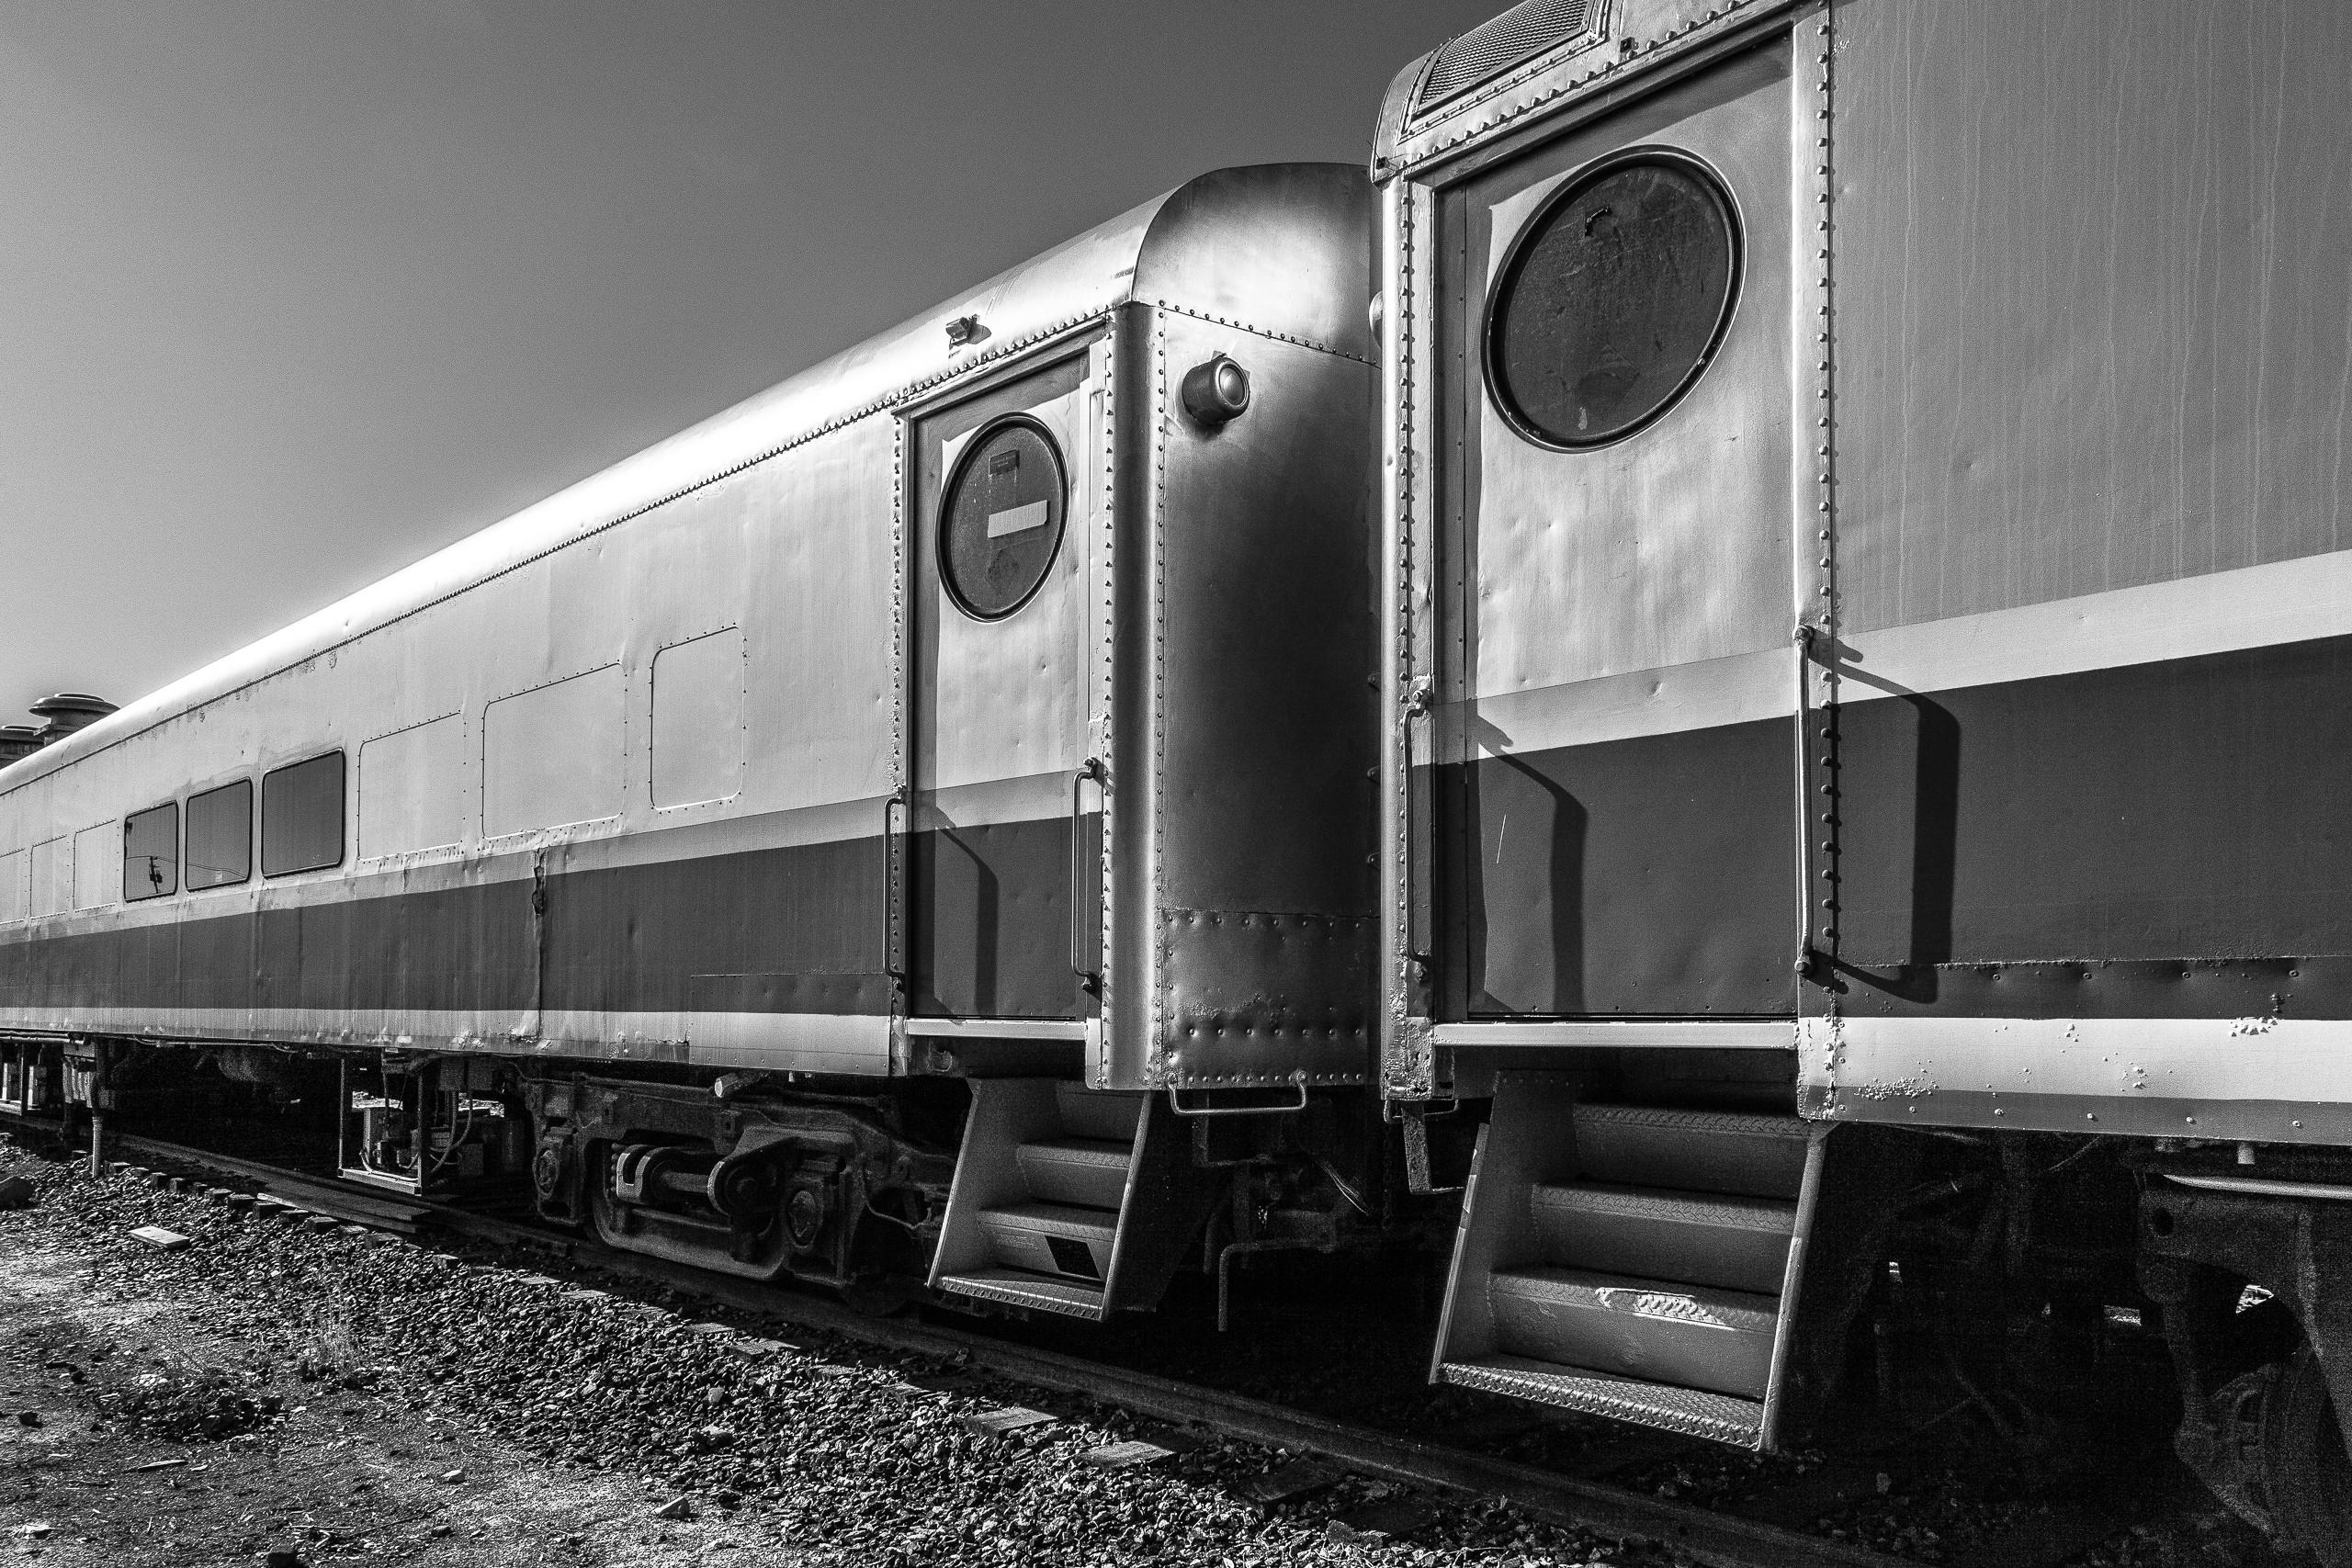 The Dinner Train